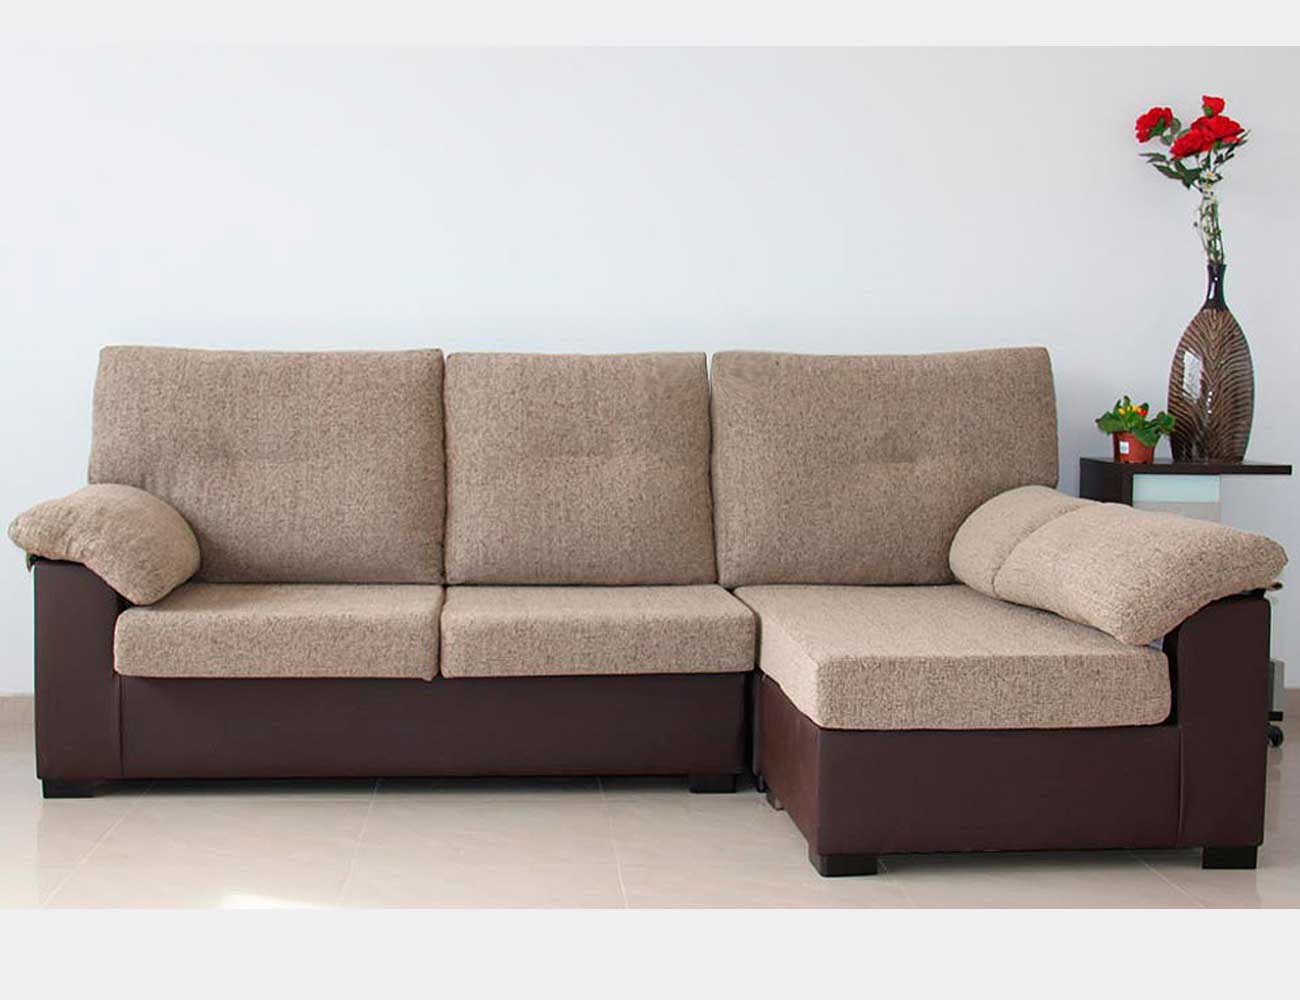 Sofa chaise longue barato1